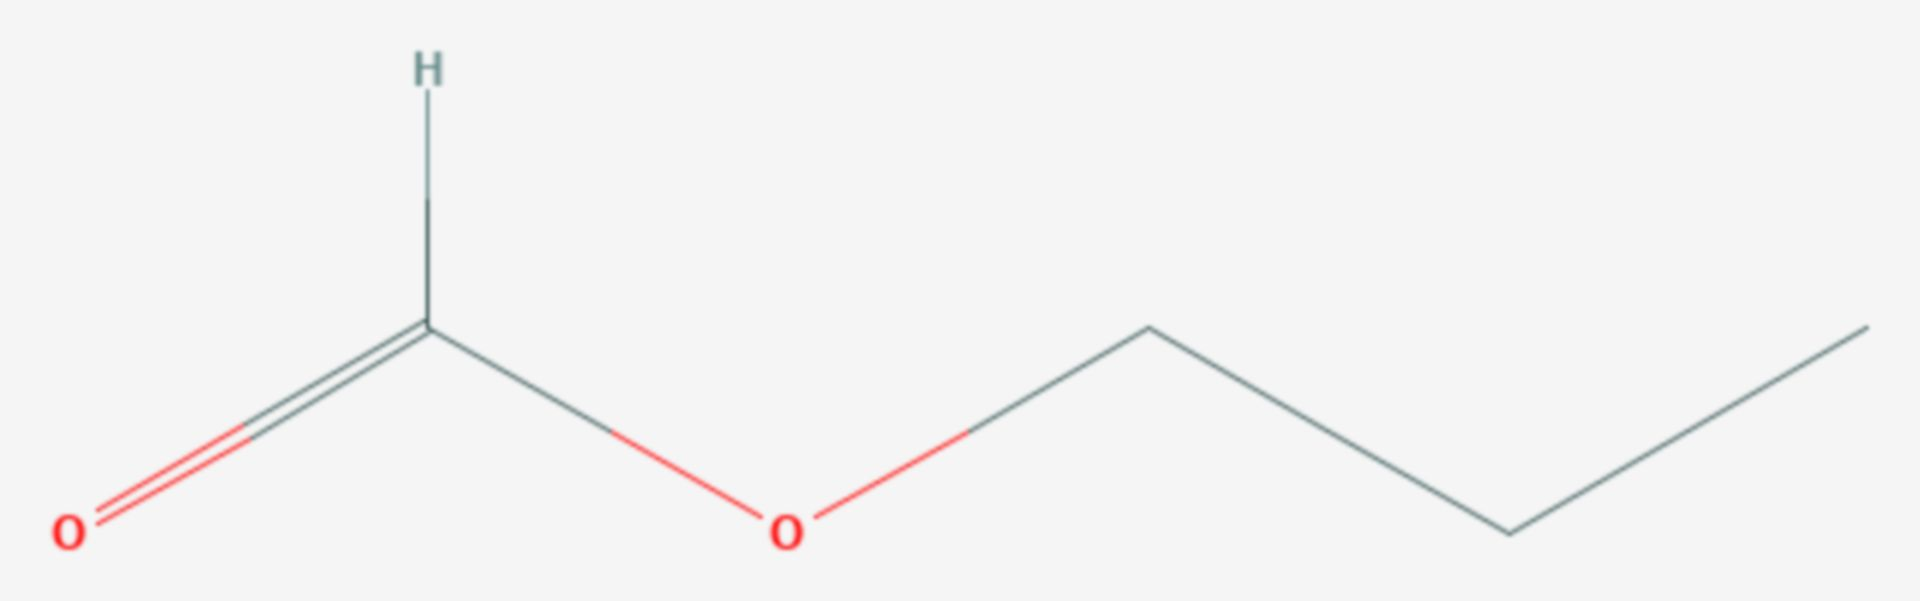 Ameisensäurepropylester (Strukturformel)